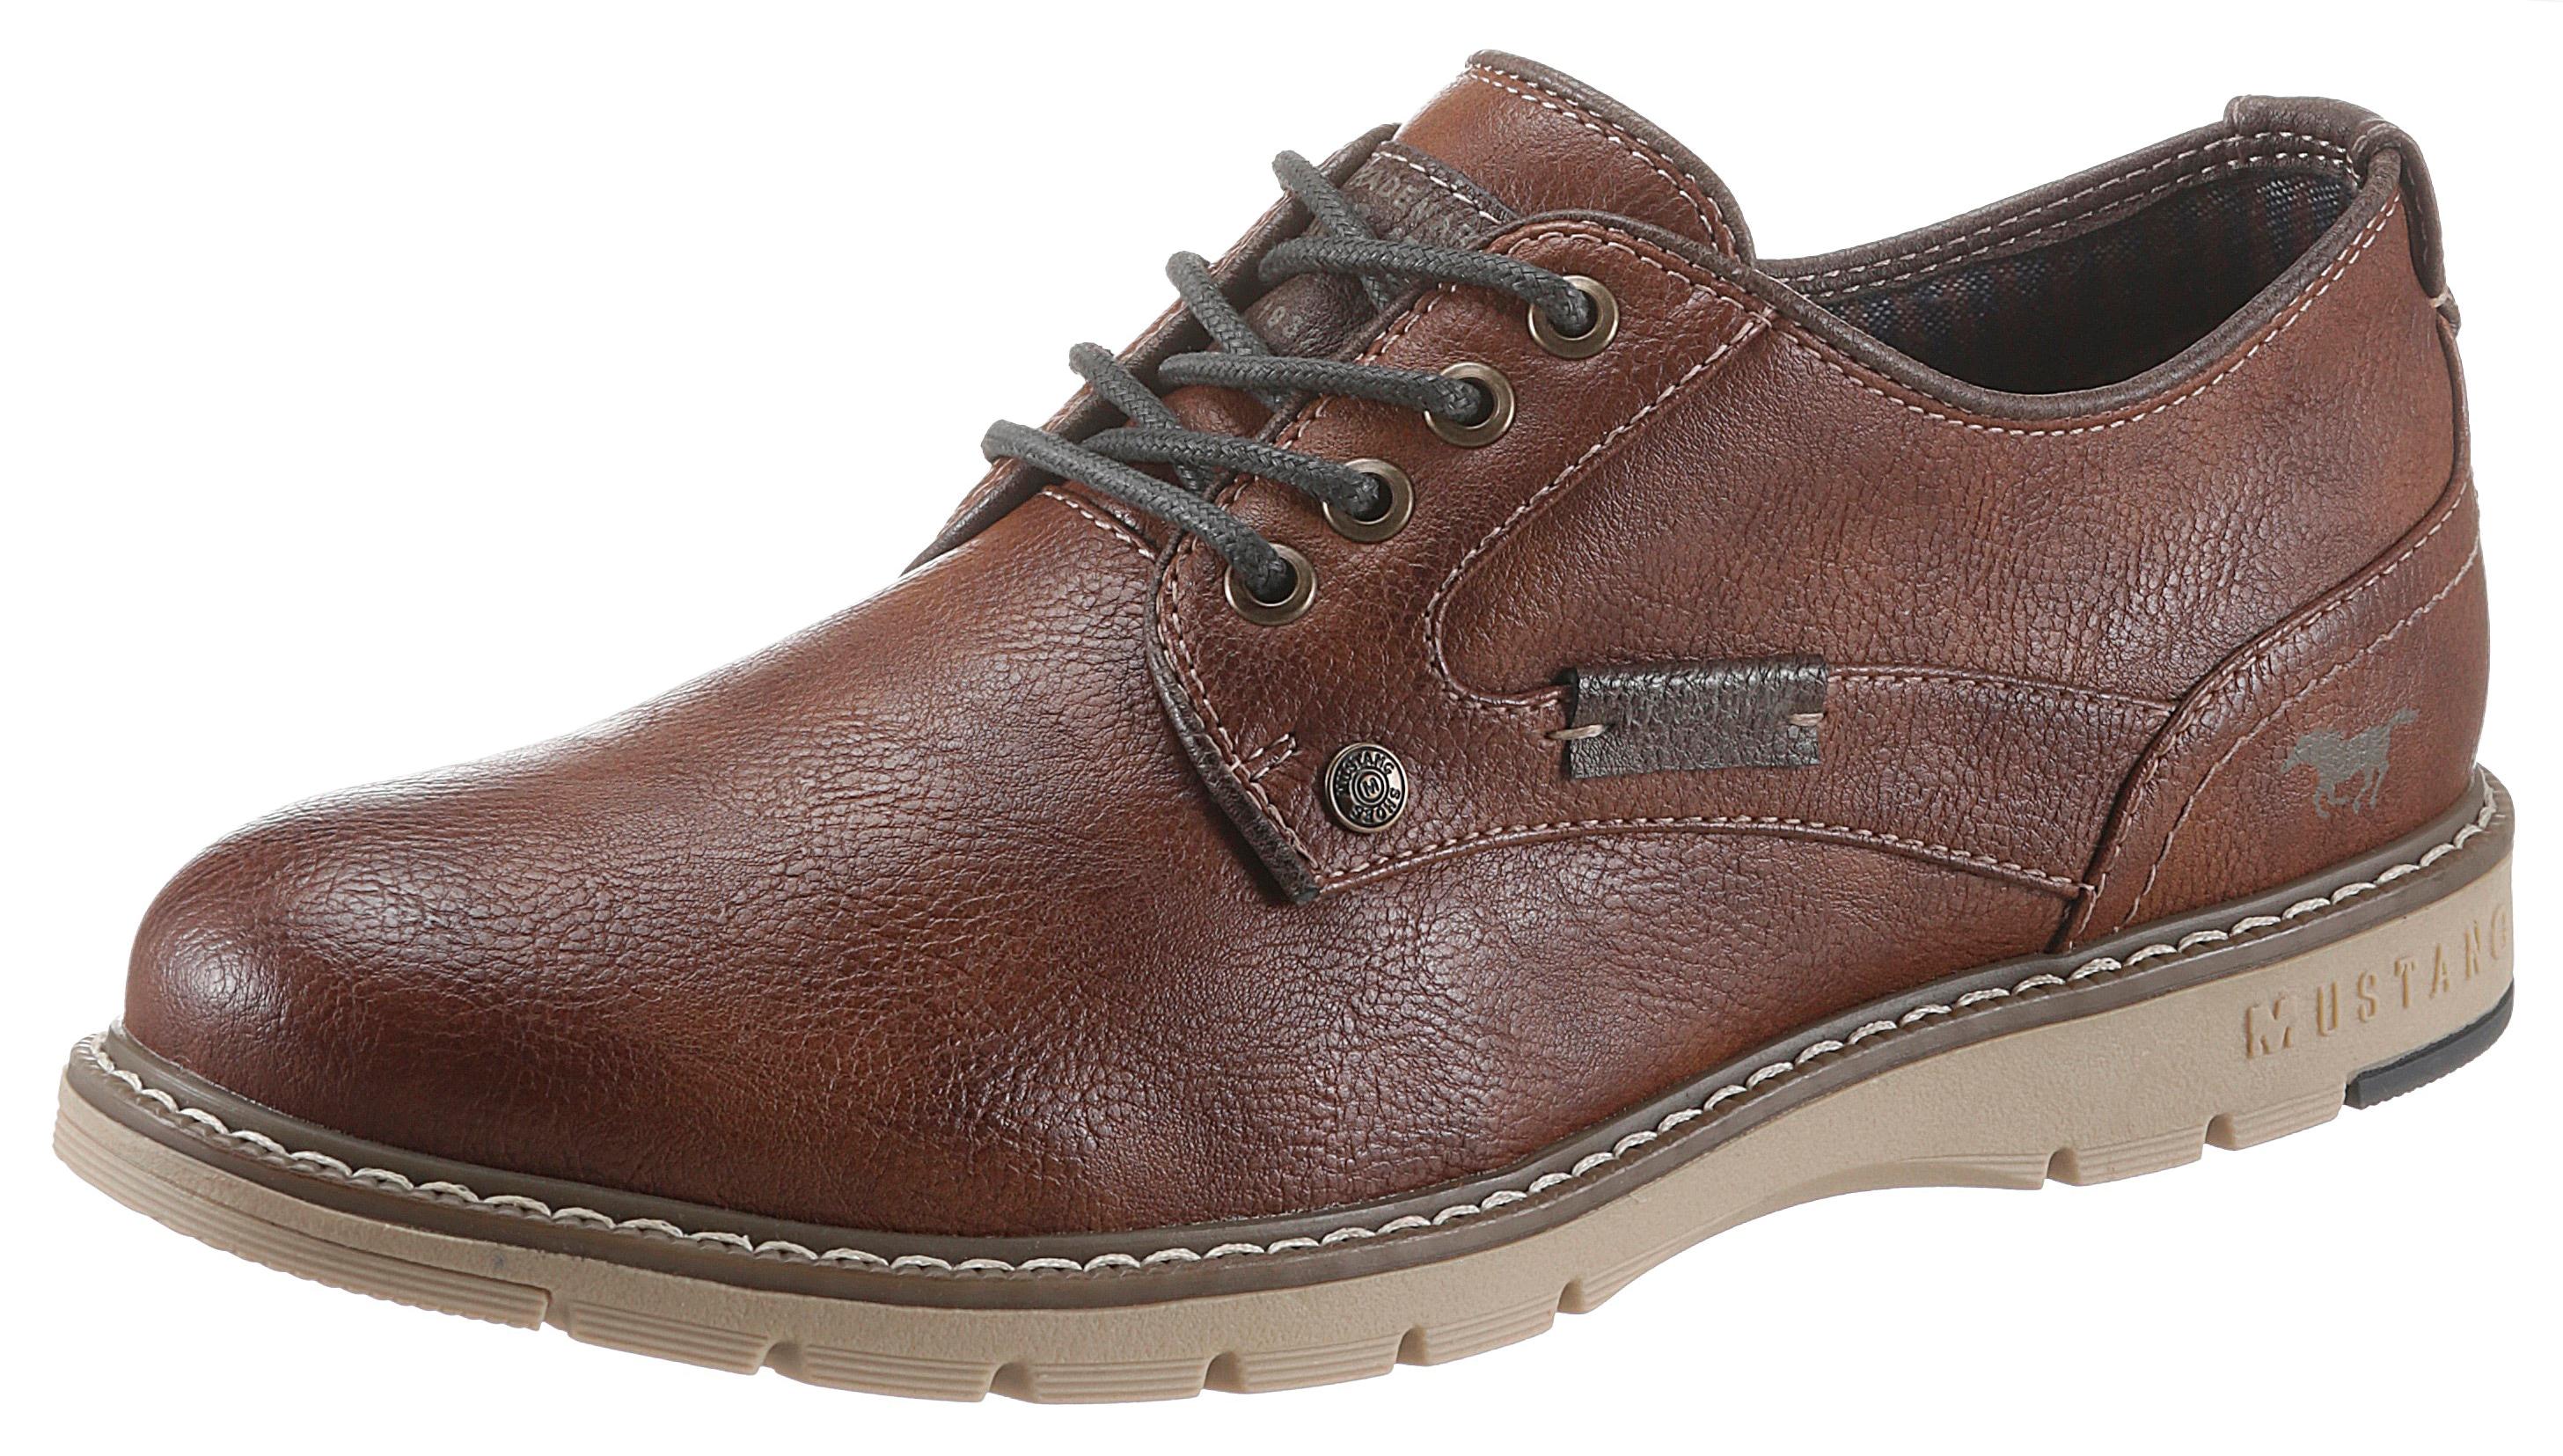 mustang shoes -  Schnürschuh, mit heller Ziernaht